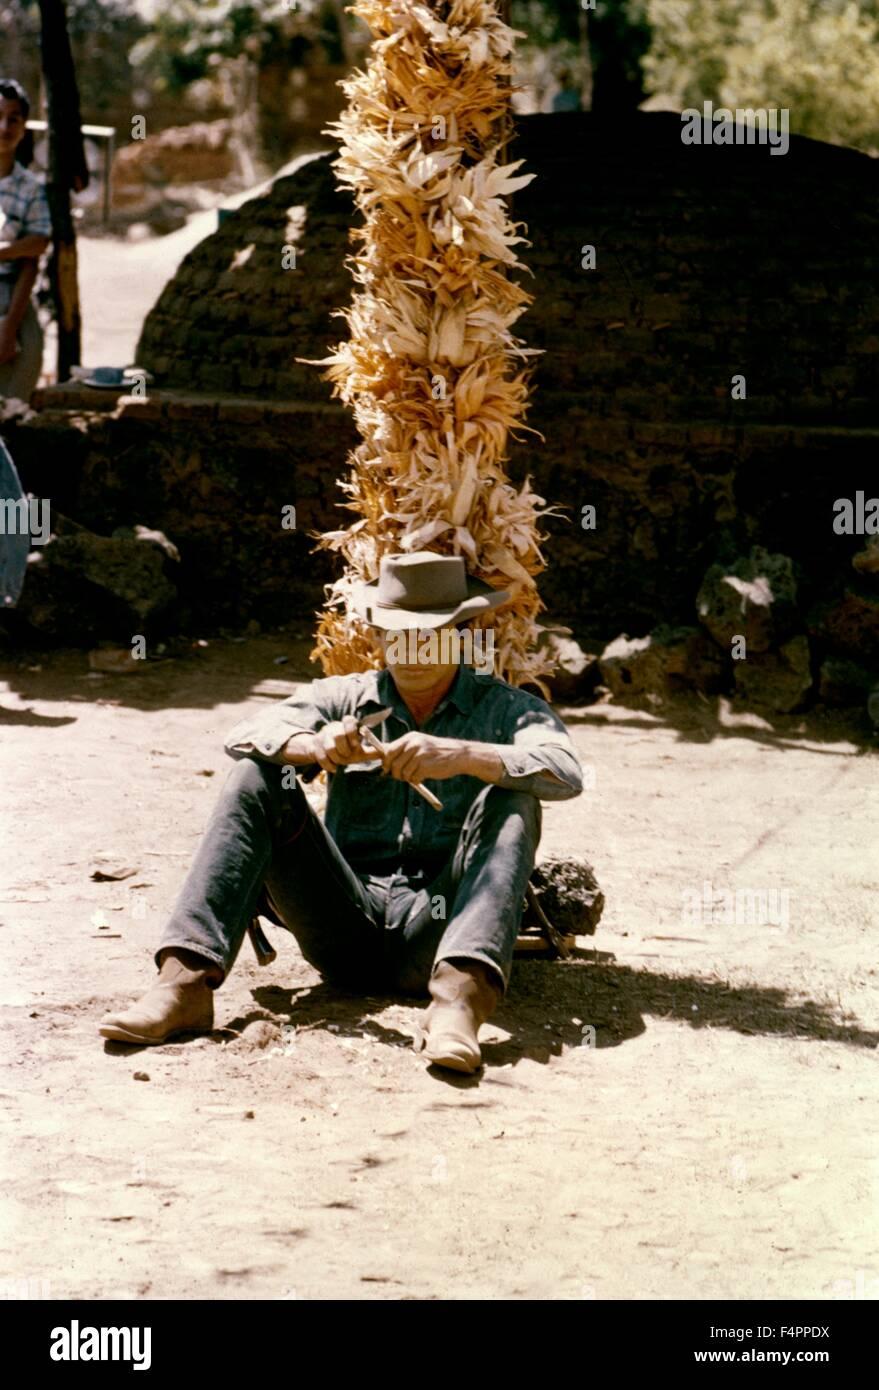 Charles Bronson / I magnifici sette / 1960 diretto da John Sturges [United Artists] Immagini Stock